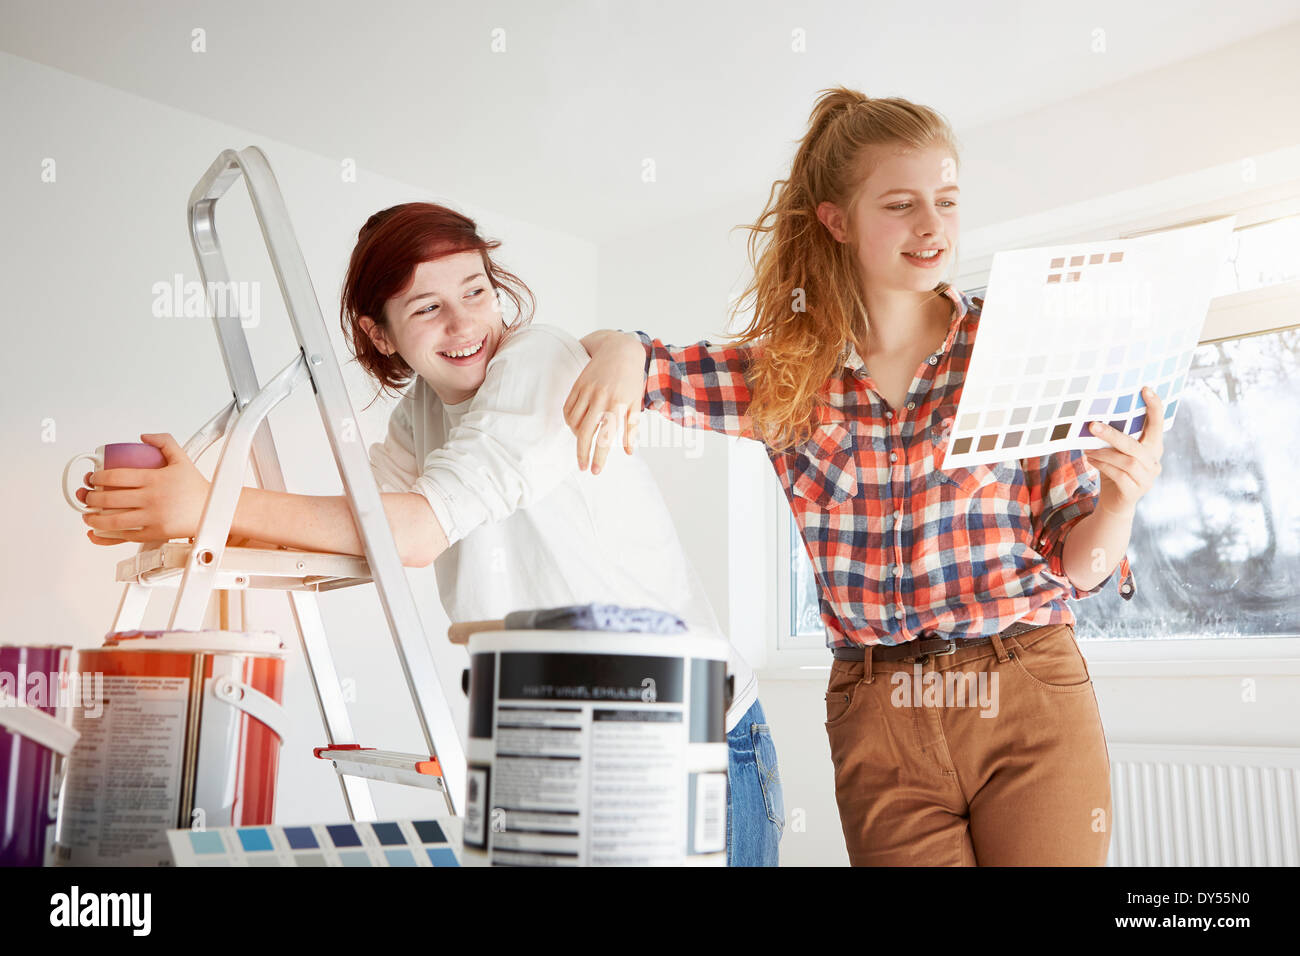 Two teenage sisters preparing to decorate bedroom - Stock Image